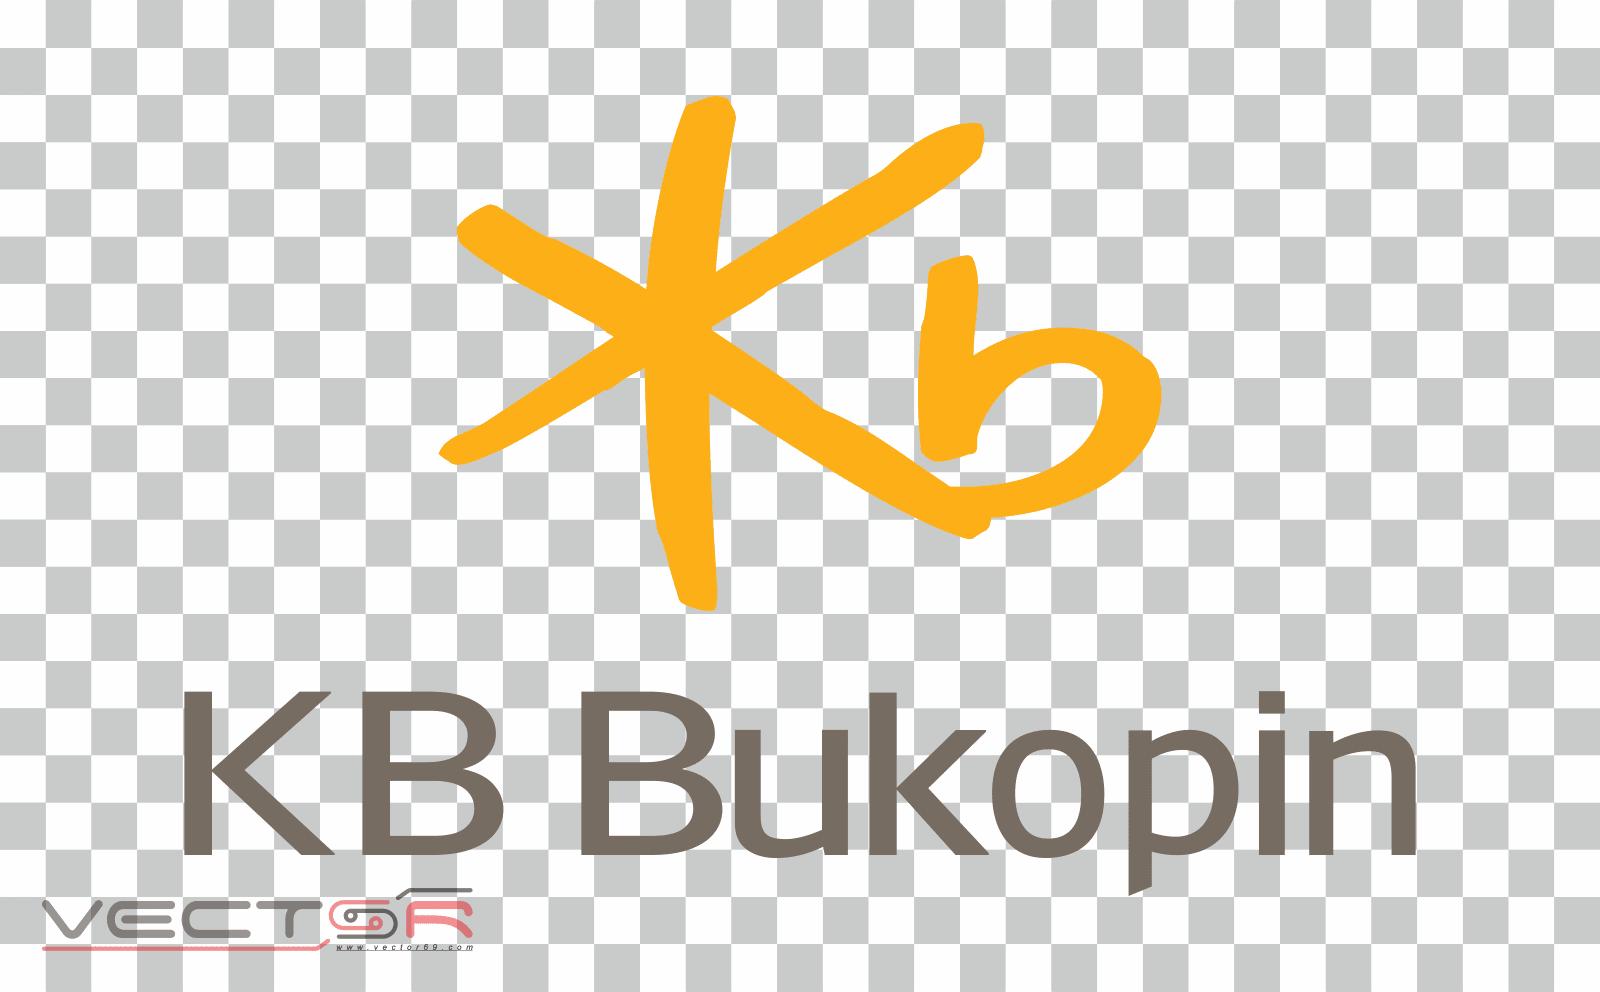 Bank KB Bukopin (2021) Vertical Logo - Download .PNG (Portable Network Graphics) Transparent Images